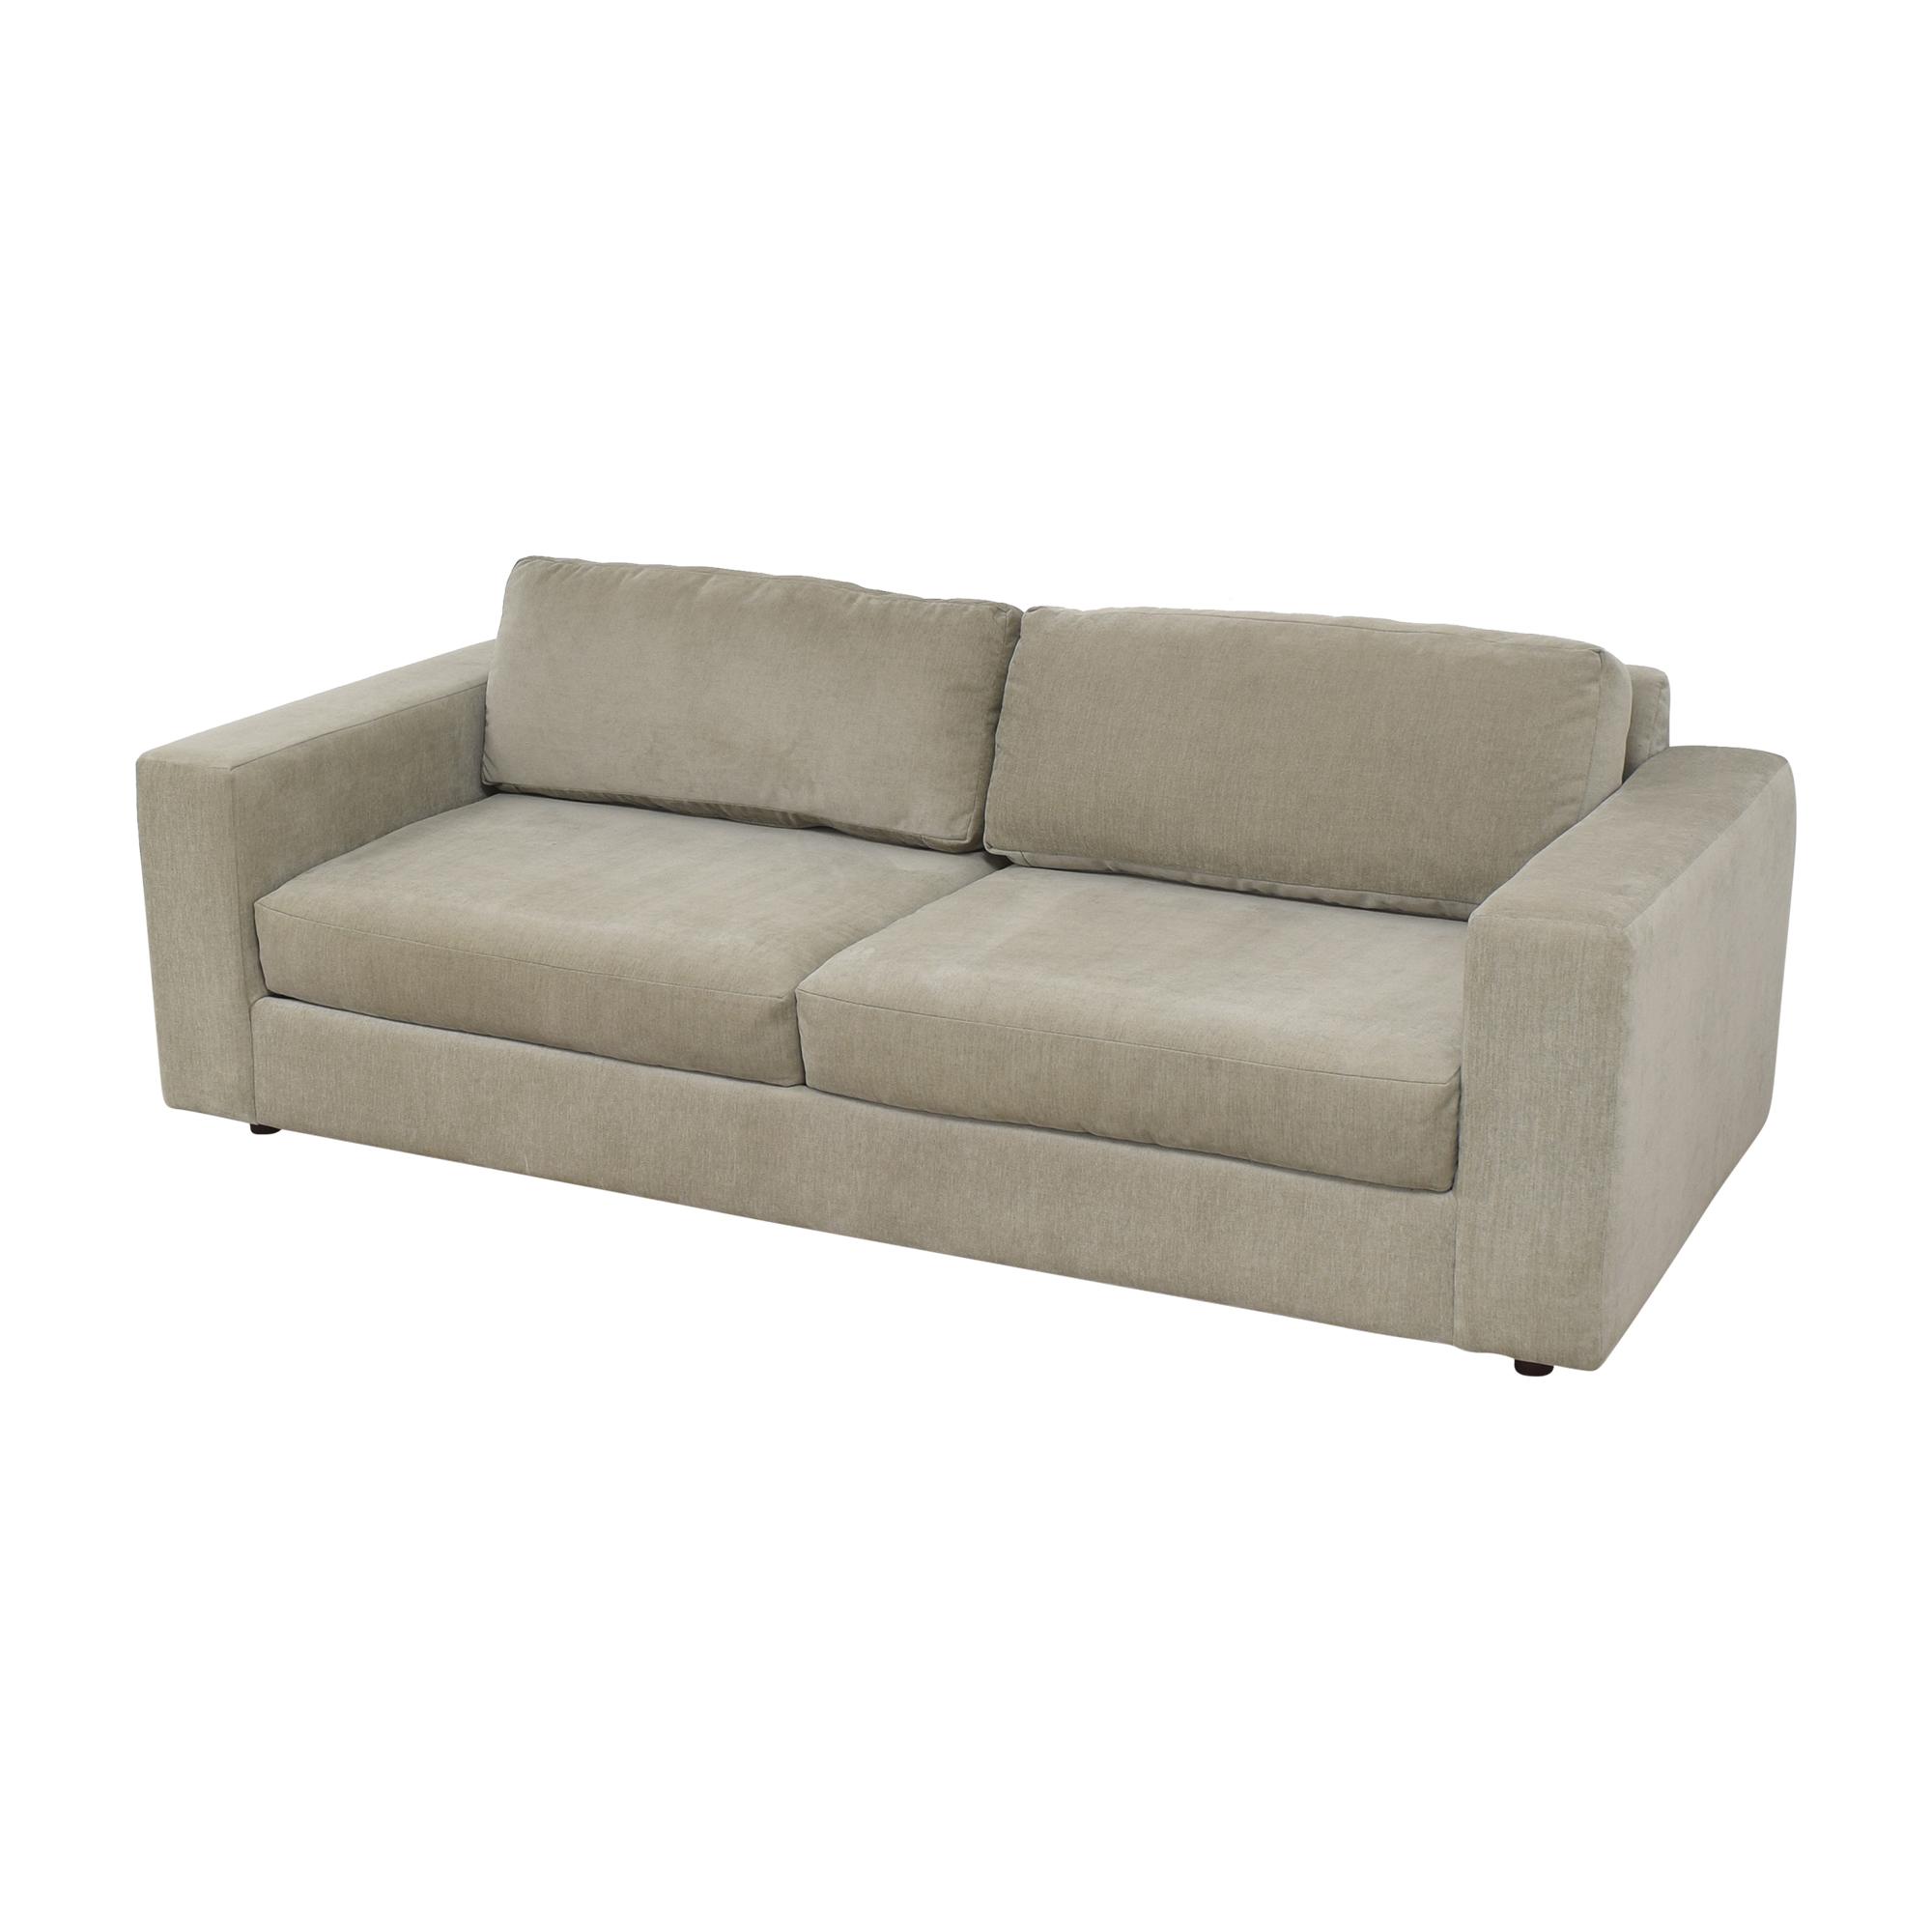 West Elm West Elm Urban Sofa